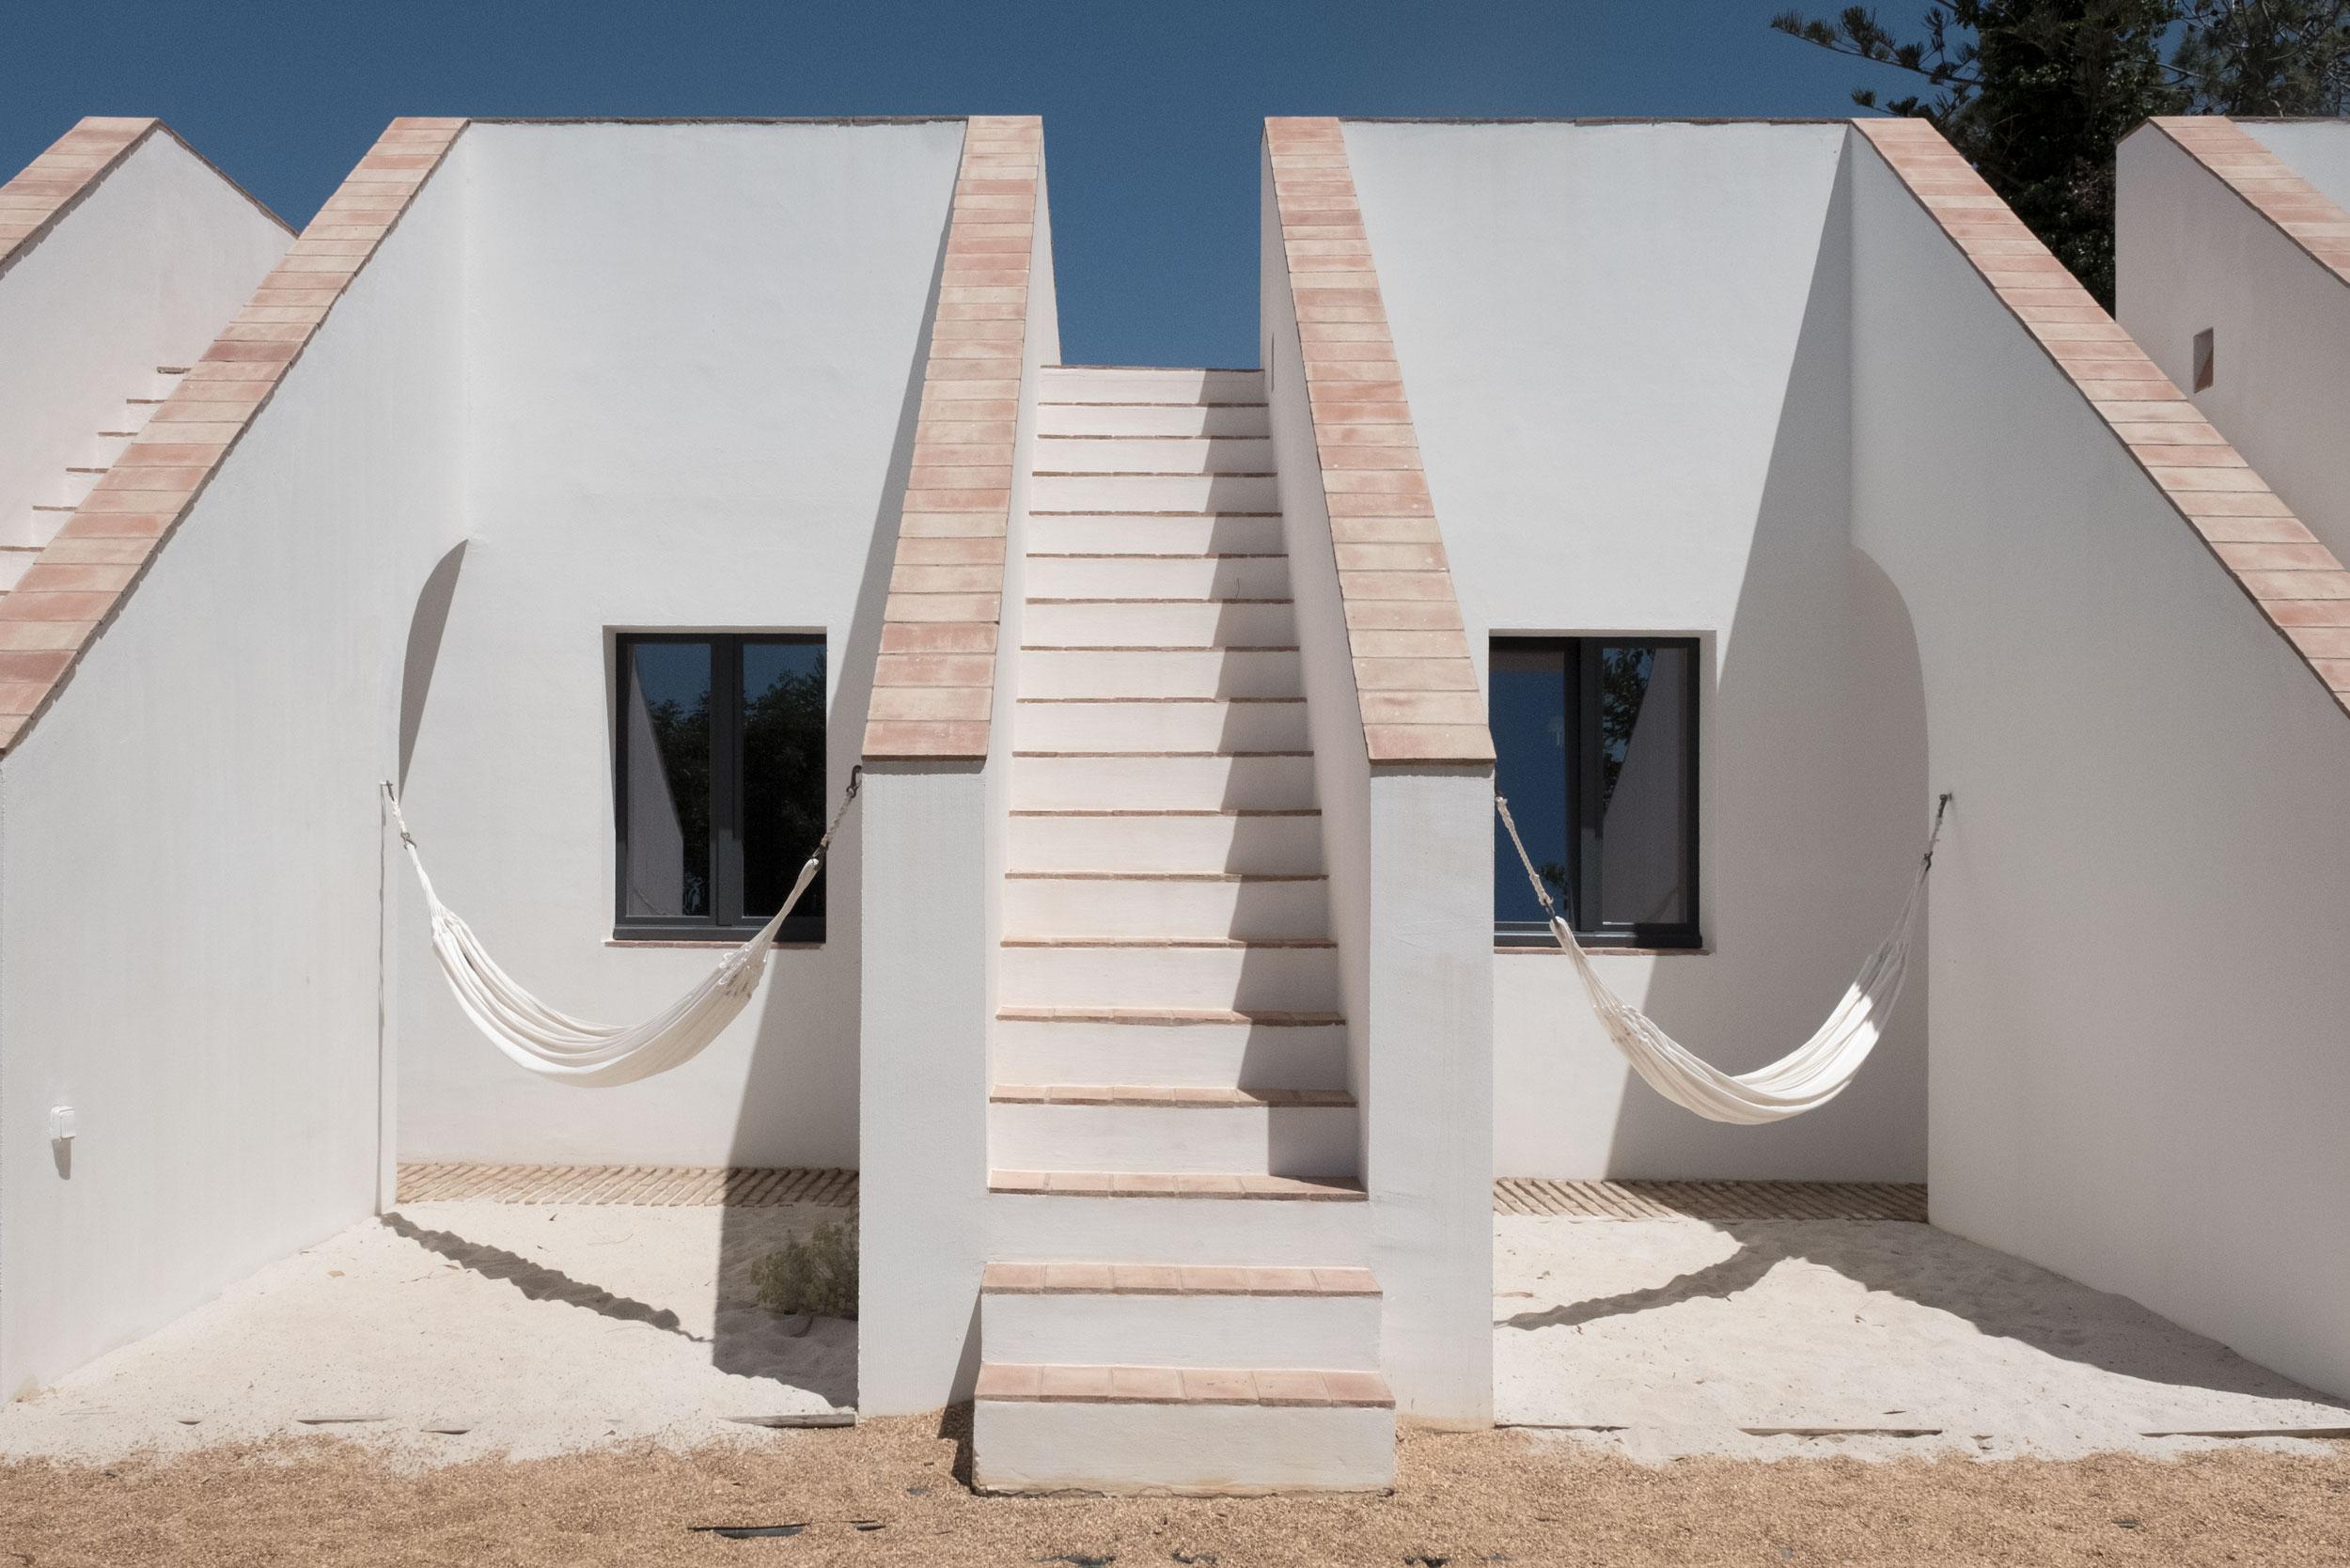 Casa-Modesta-exterior-Fiona-Burrage-Stairs.jpg